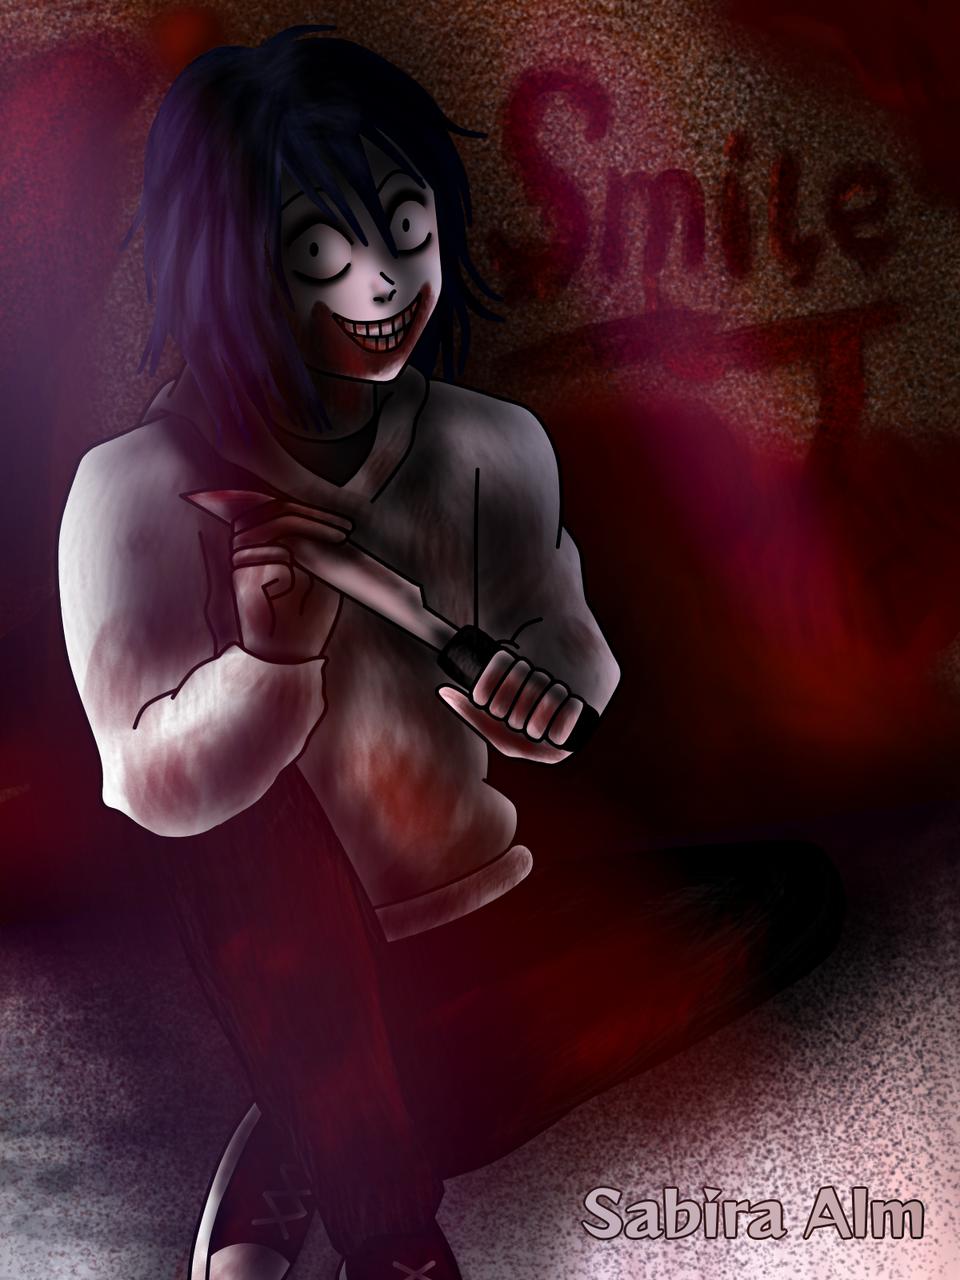 Jeff Illust of Sabira Alm horror August2020_Contest:Horror medibangpaint illustration painting Artwork digital art drawing